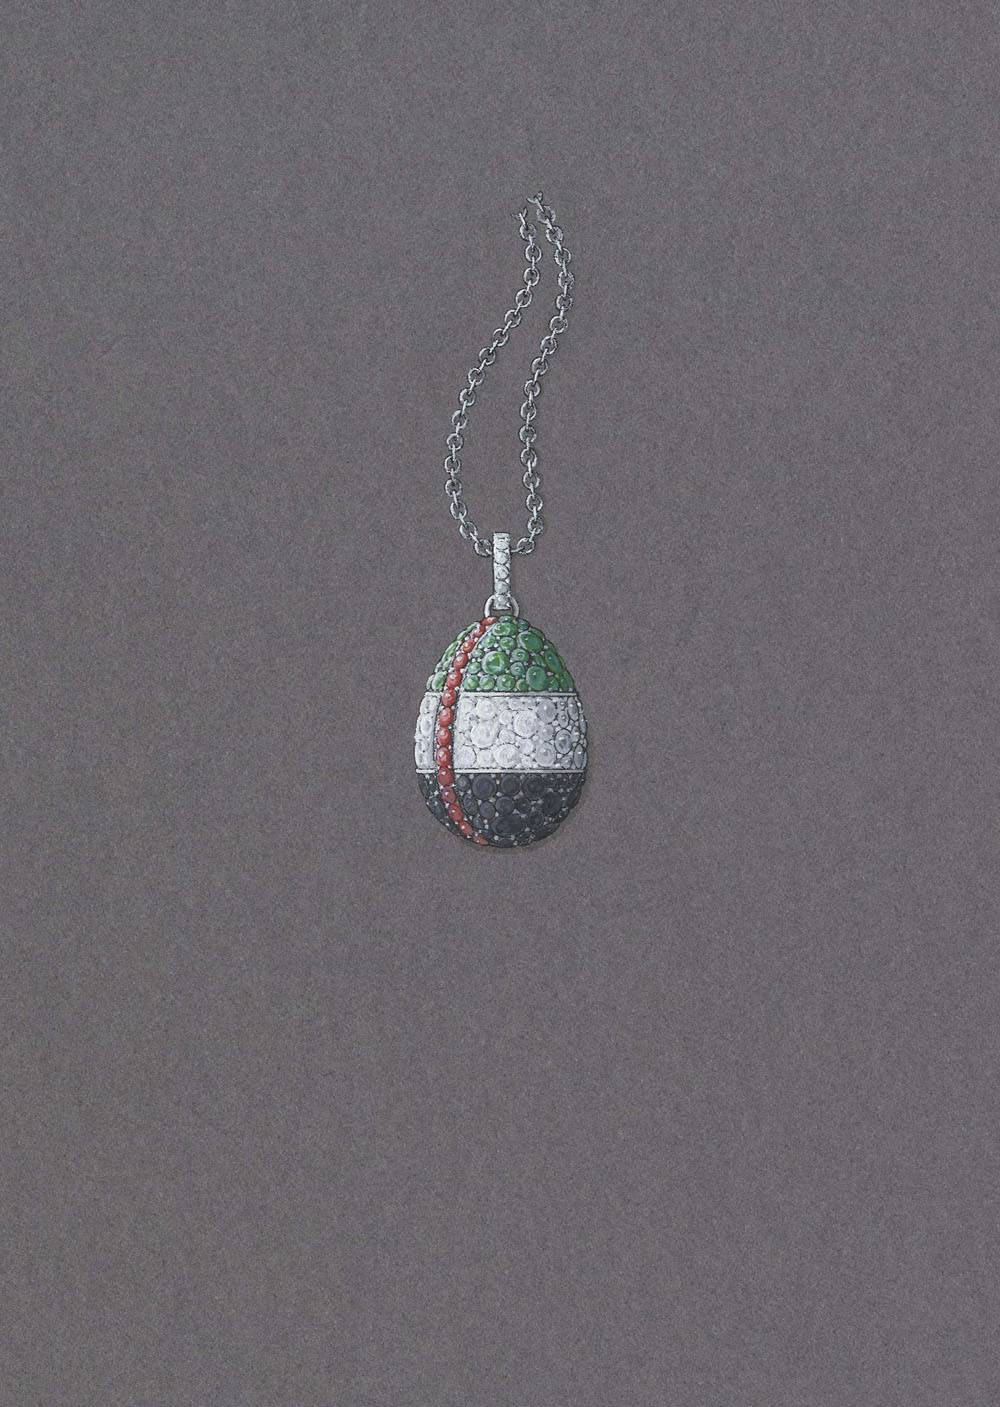 Abu Dhabi Egg with Chain LR